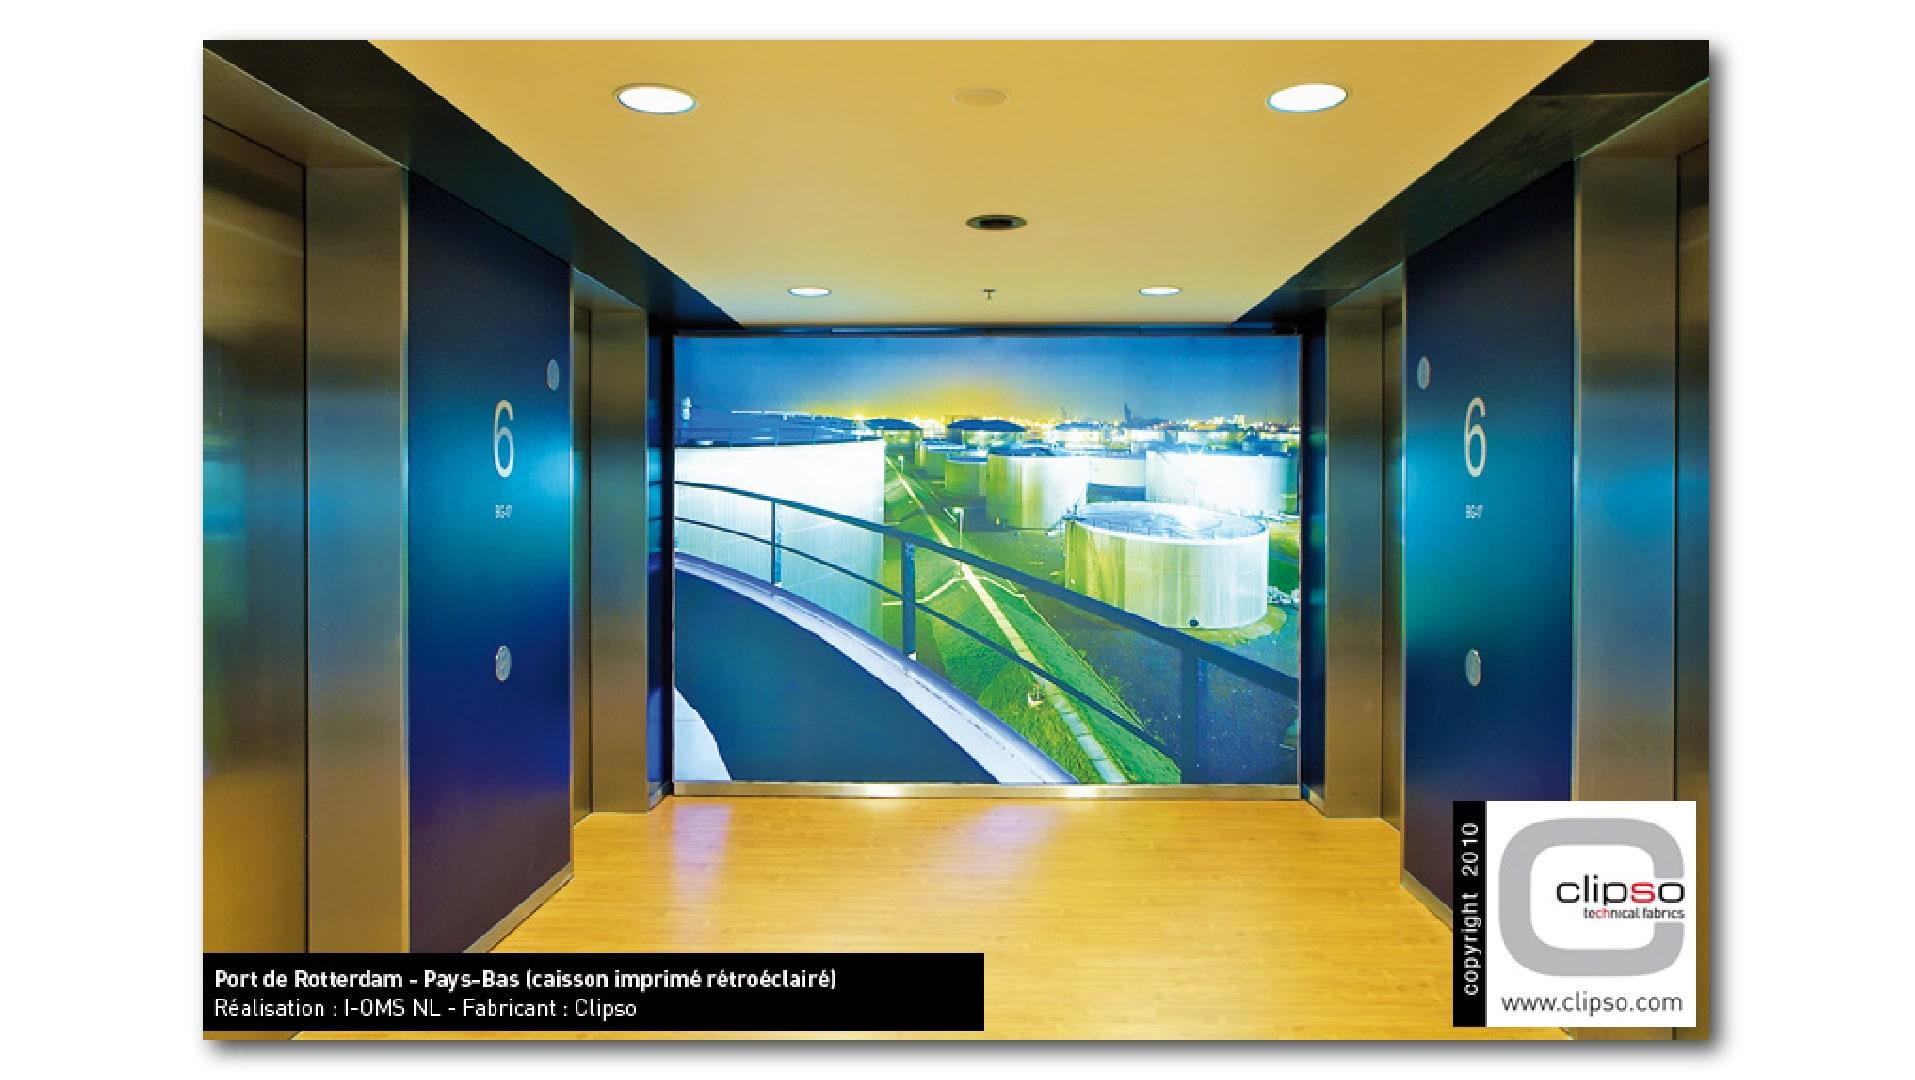 Hinterleuchtetes-Wandbild-Aufzug-01_fymwup